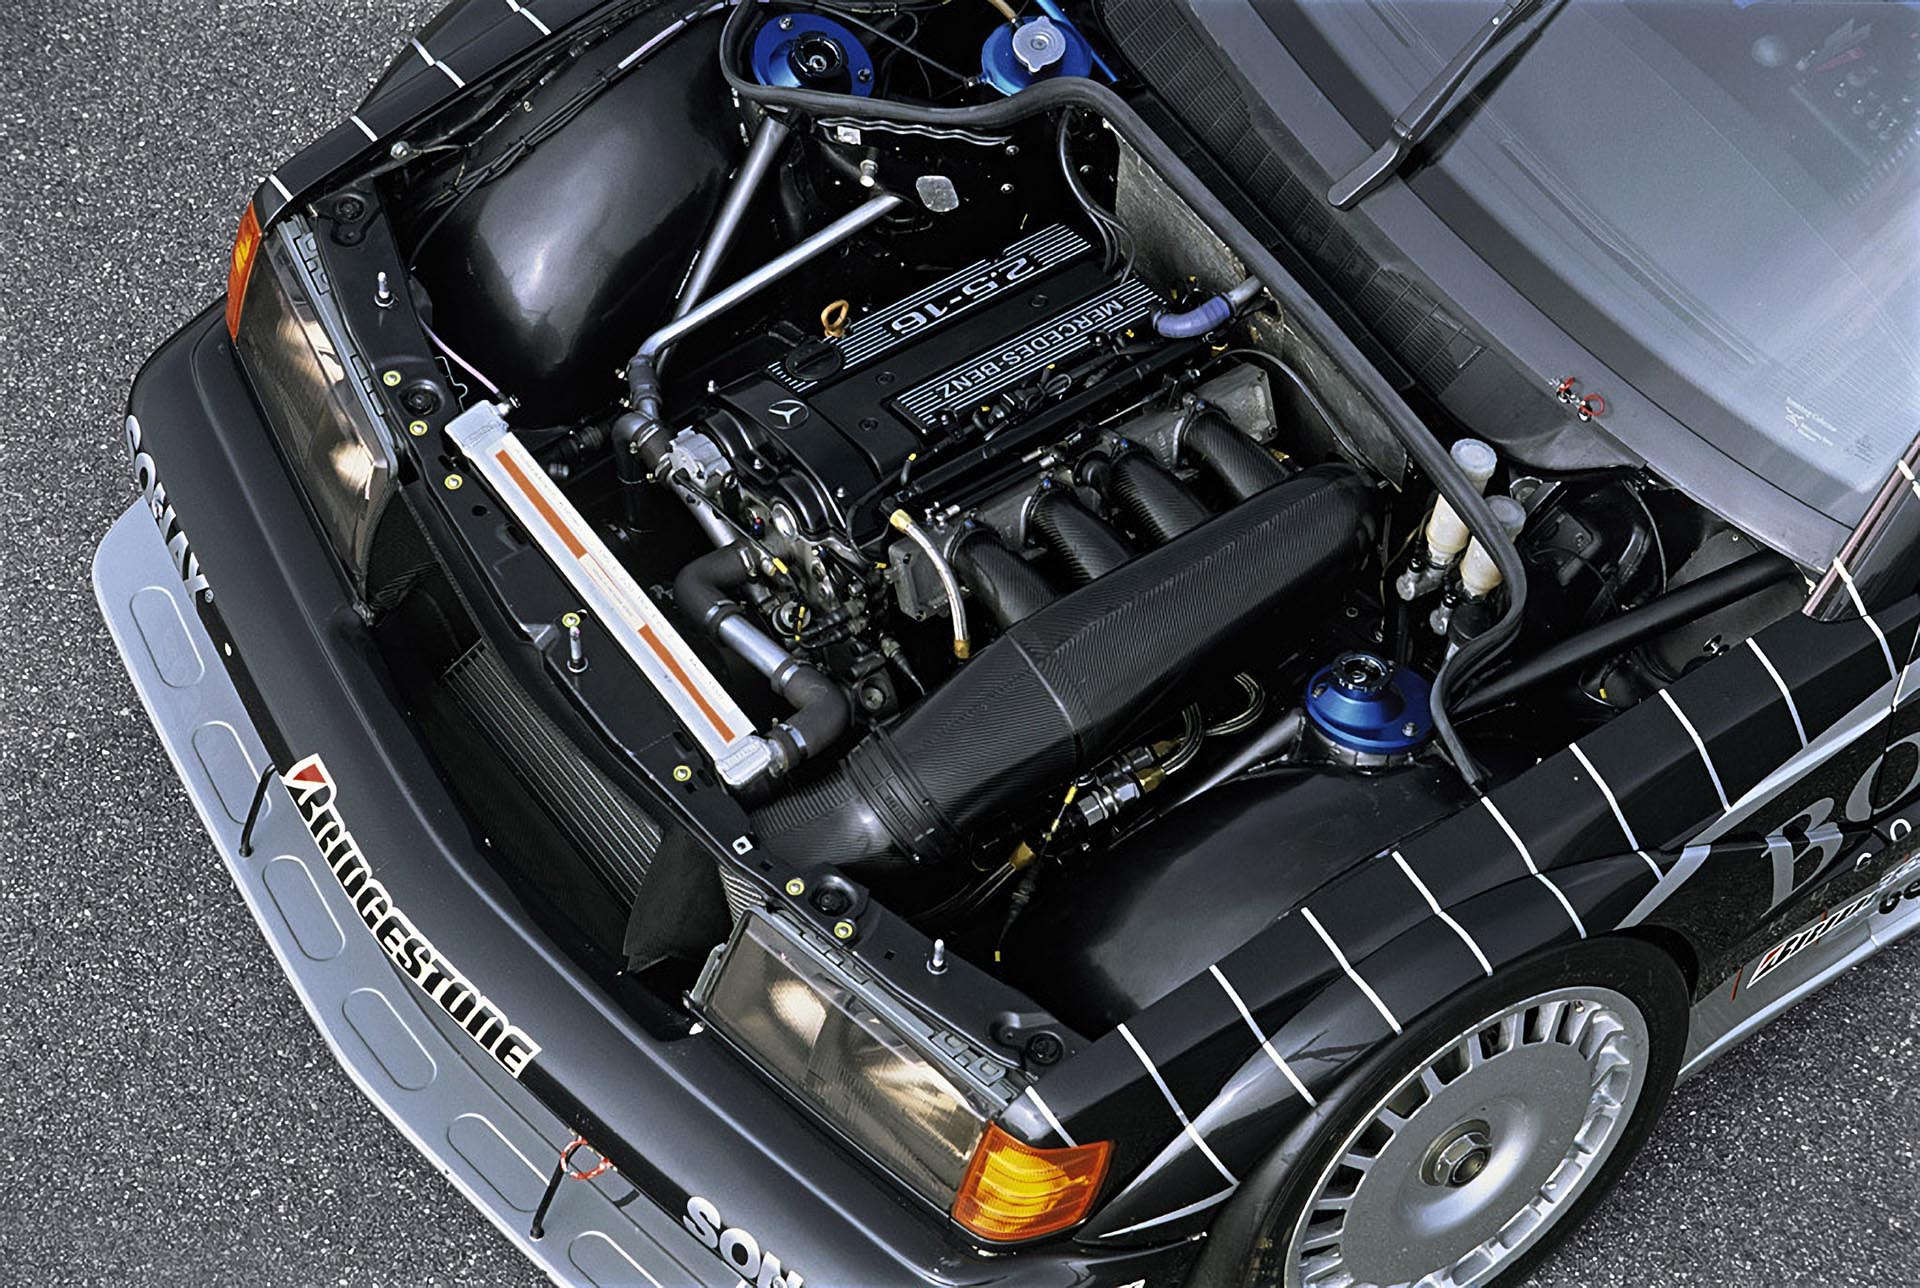 11-14_MercedesBenz190e2.5evo_engine